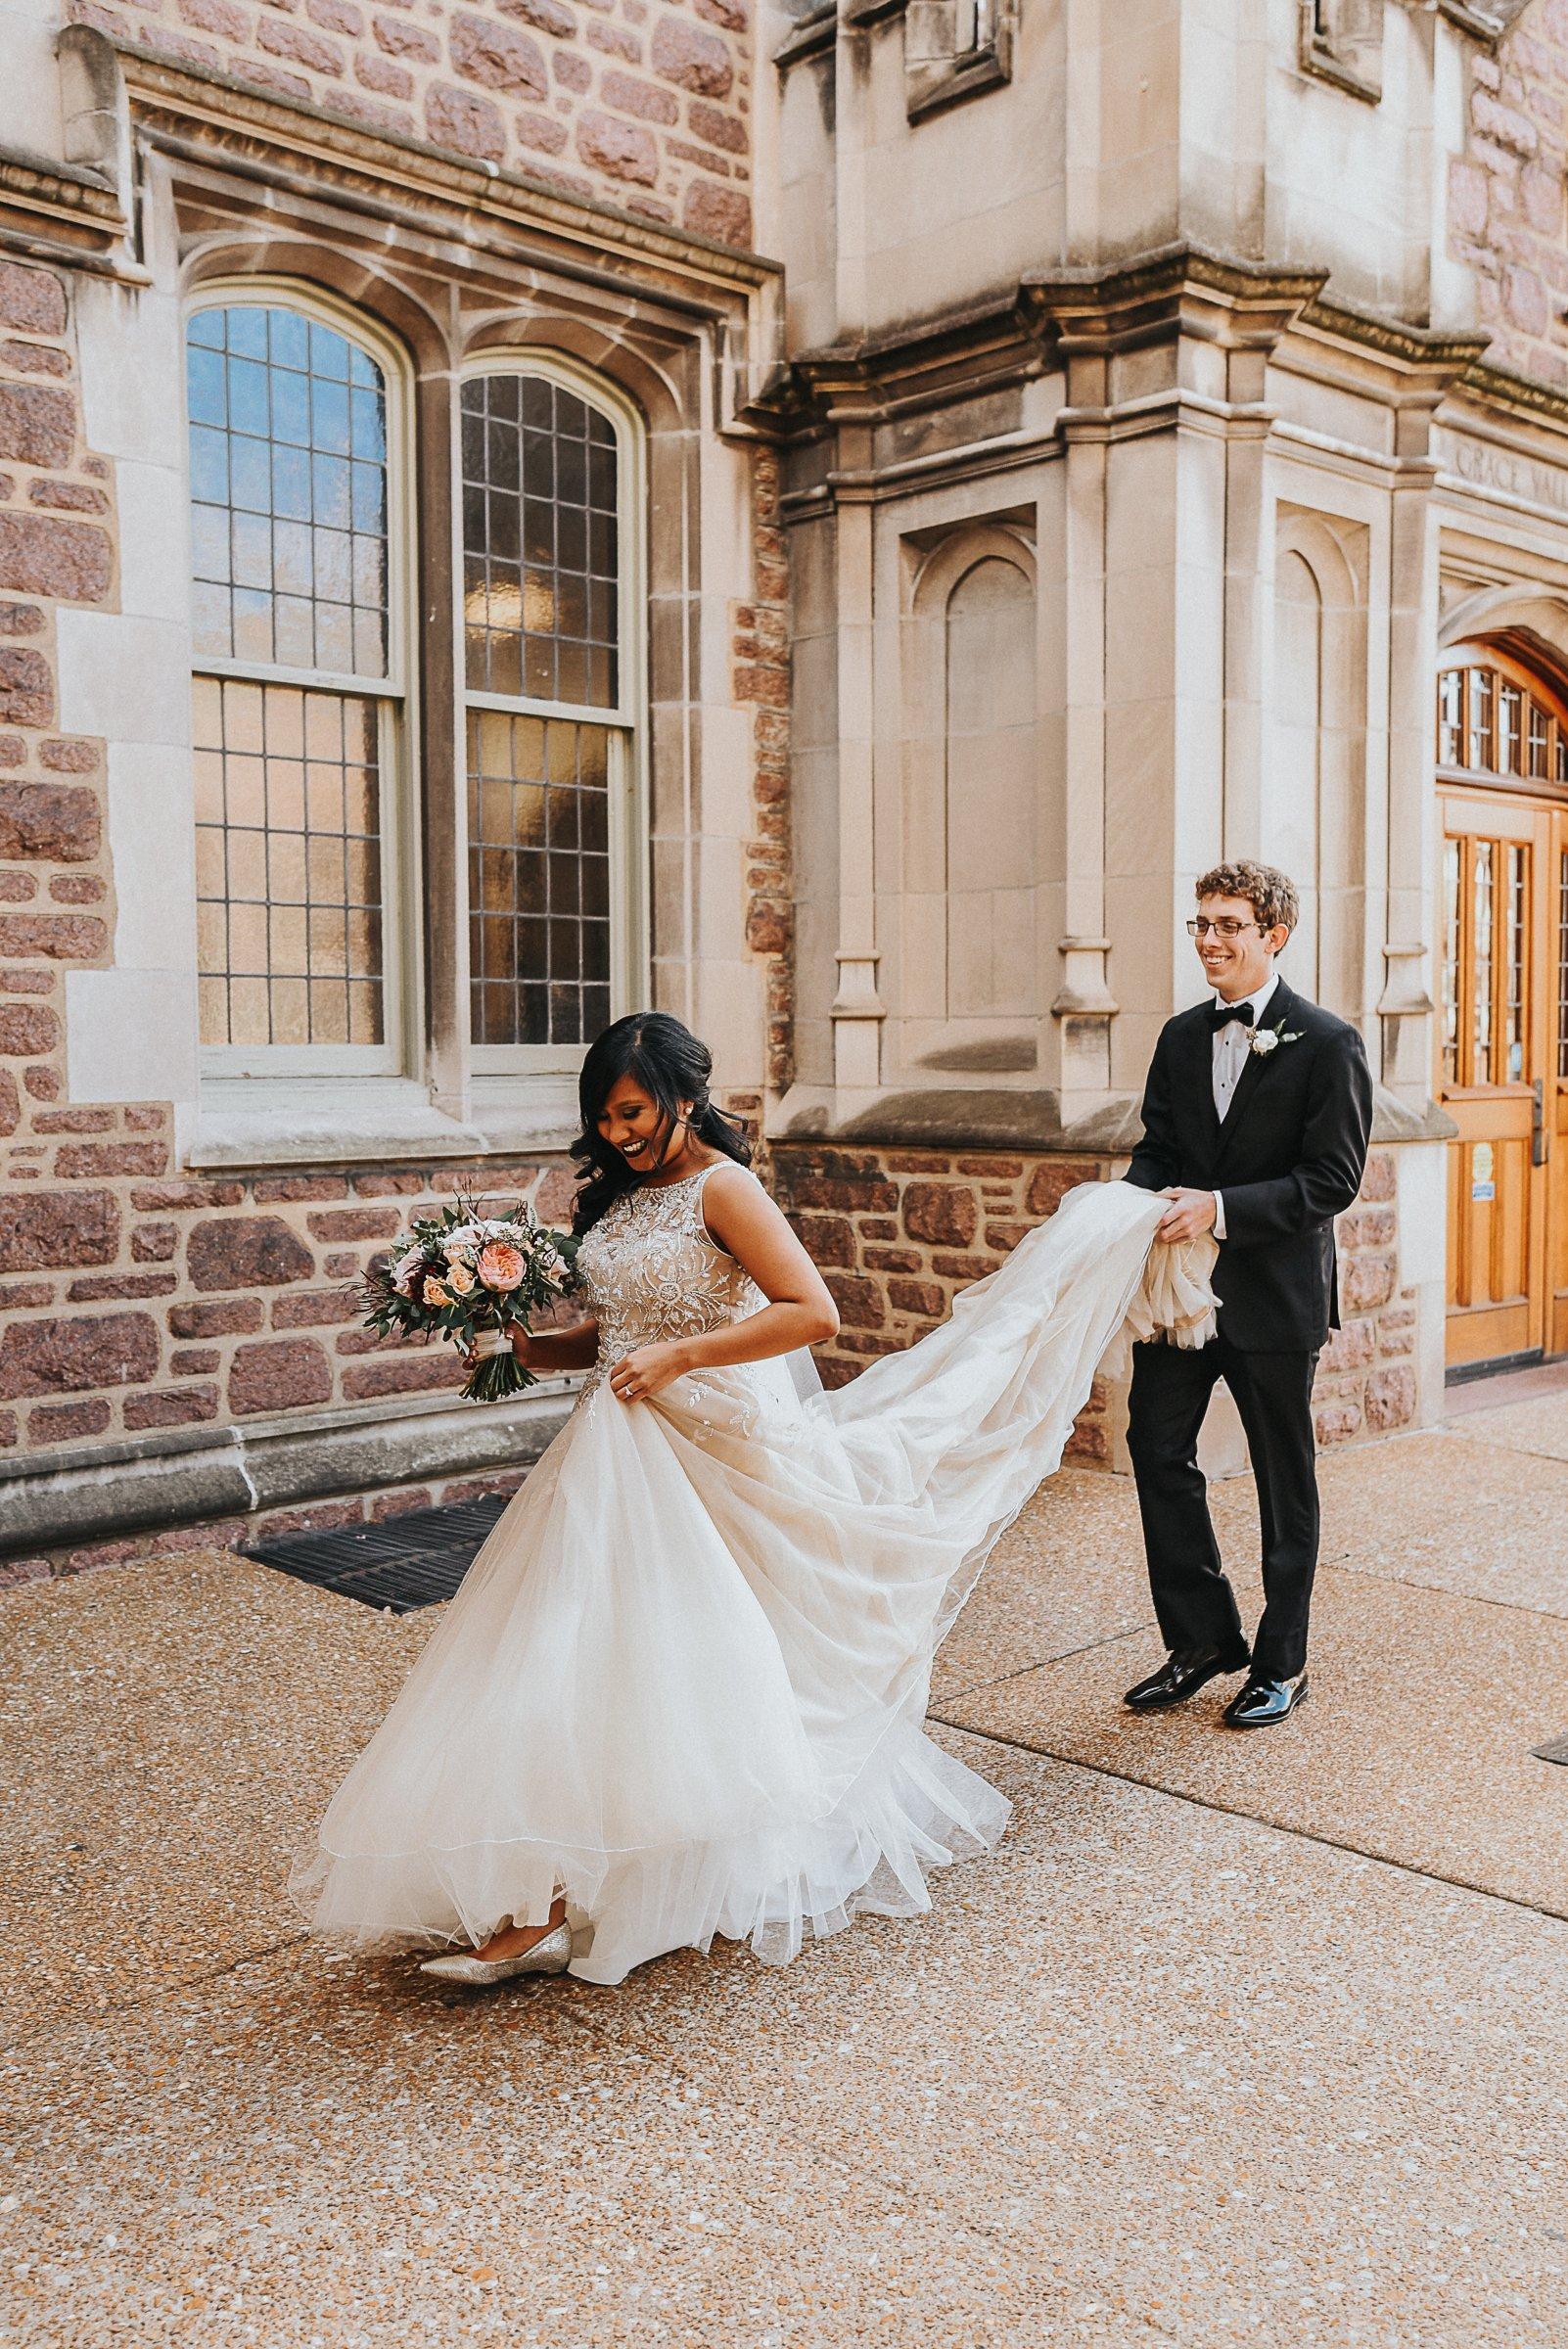 Graham chapel, St. Louis Wedding photographer, Weddings, Washington University, Wedding packages, Missouir Wedding photographer, Engagement photos, Wedding Venues, NEO on Locust, Silver Oaks Chateau